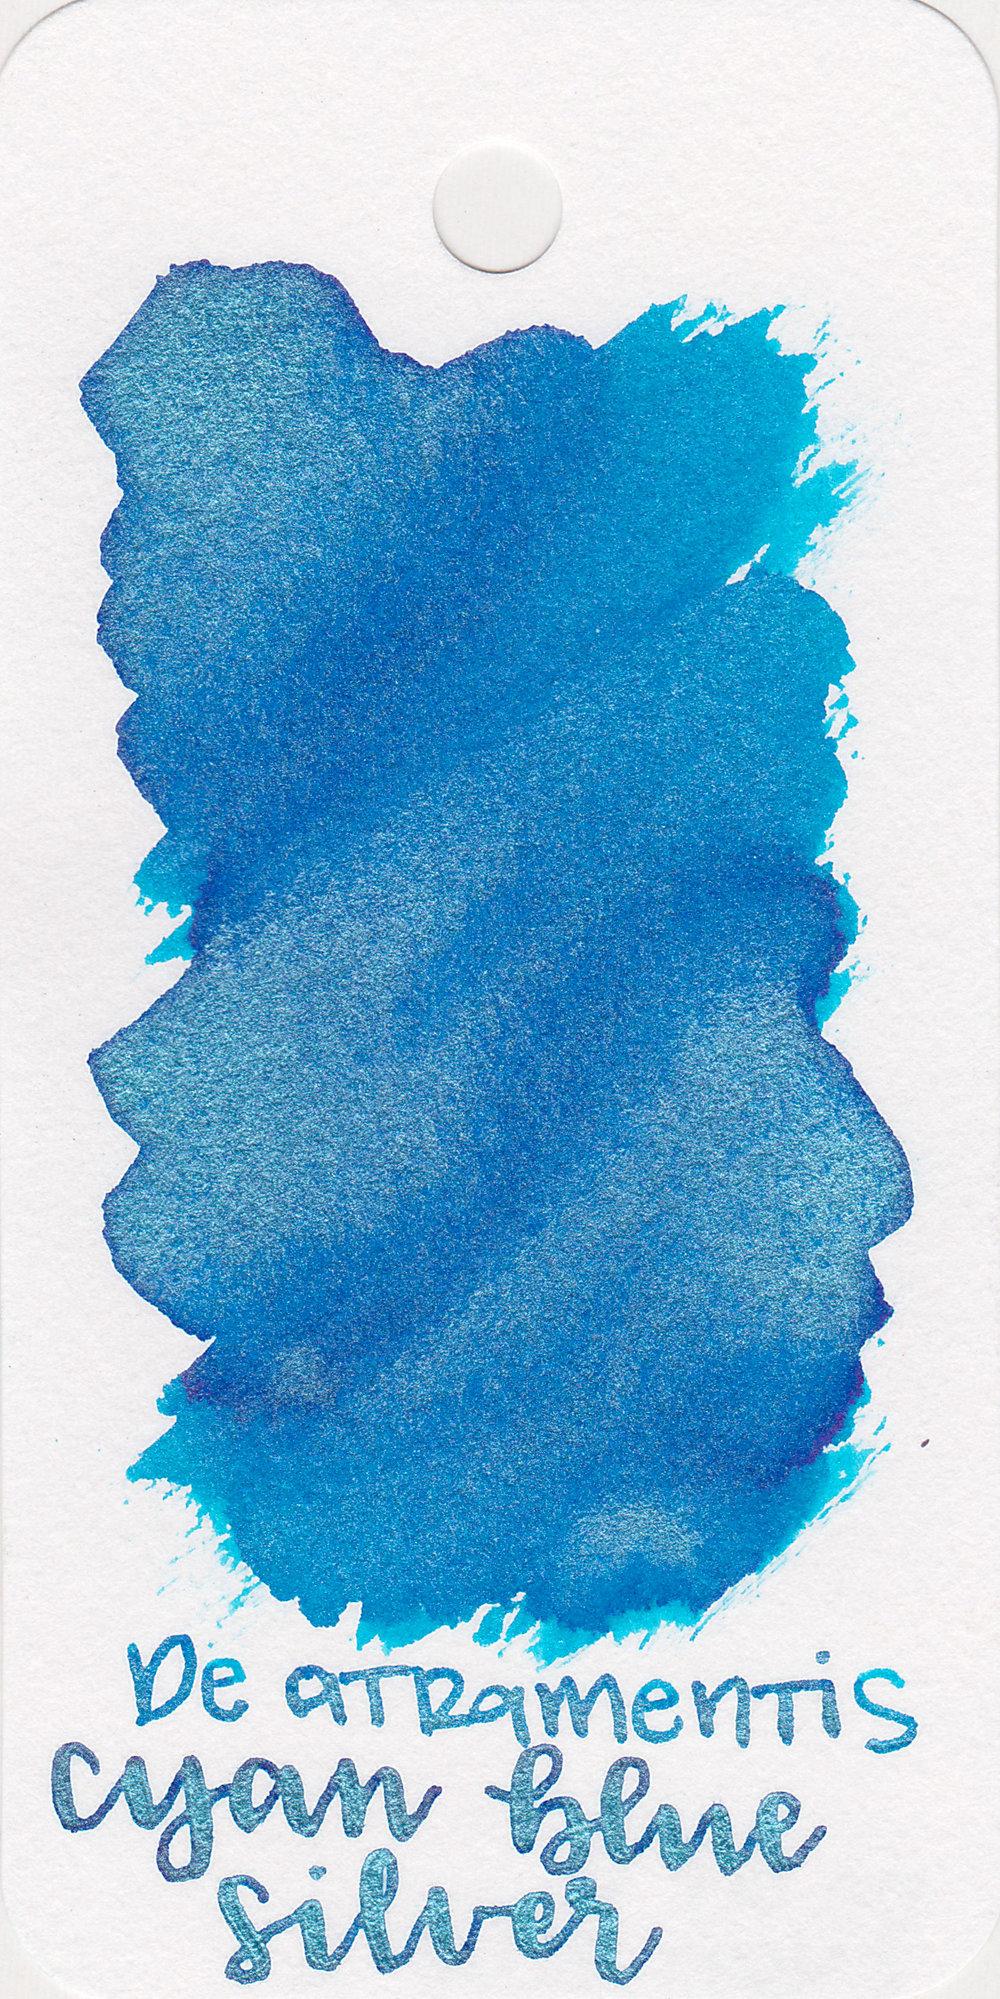 da-cyan-blue-silver-1.jpg